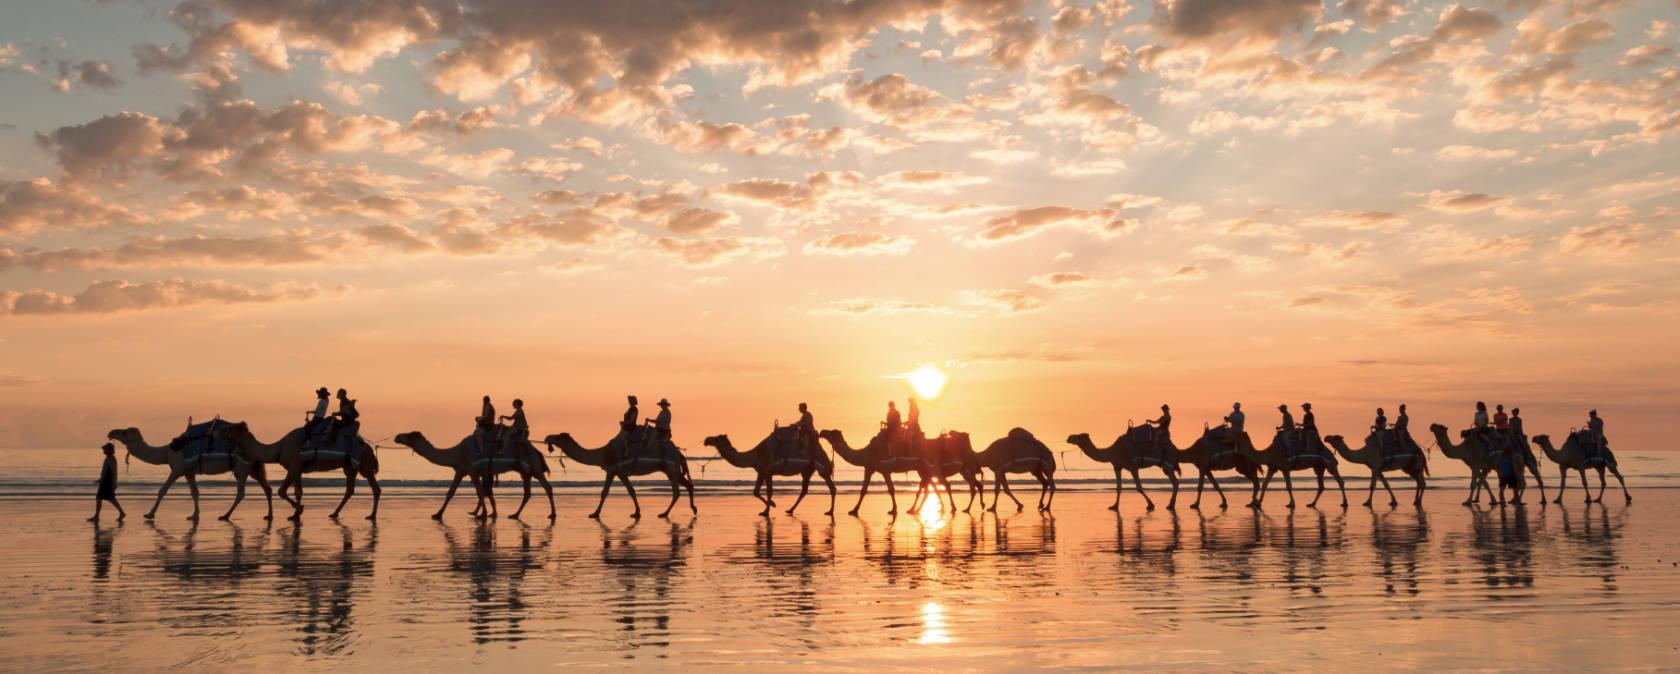 A caravan of camels walk the beach at sunset